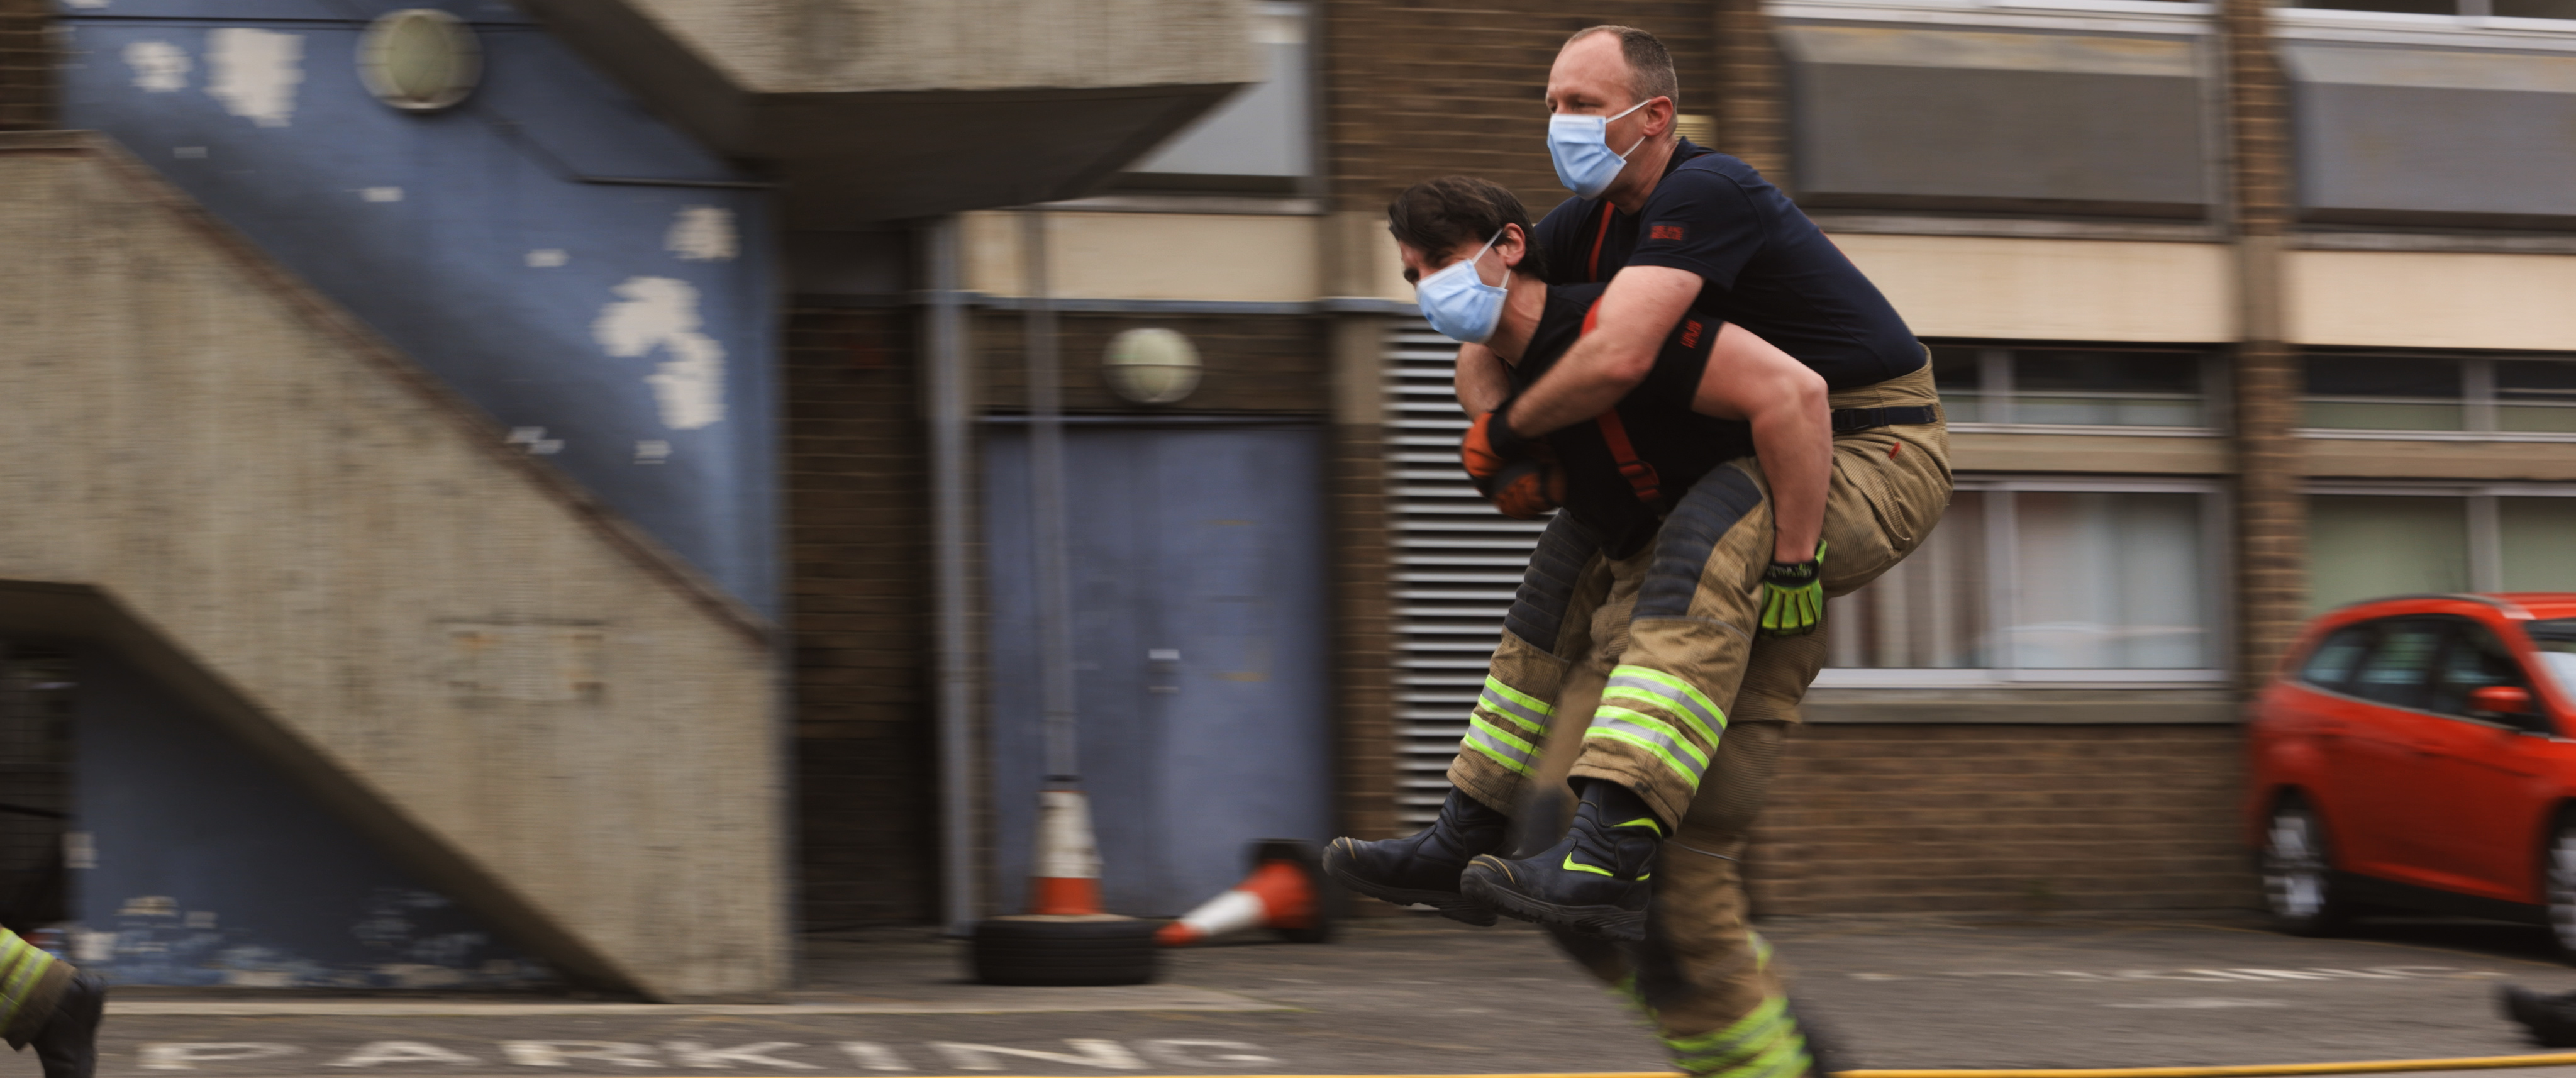 Oxfordshire Fire and Rescue Service